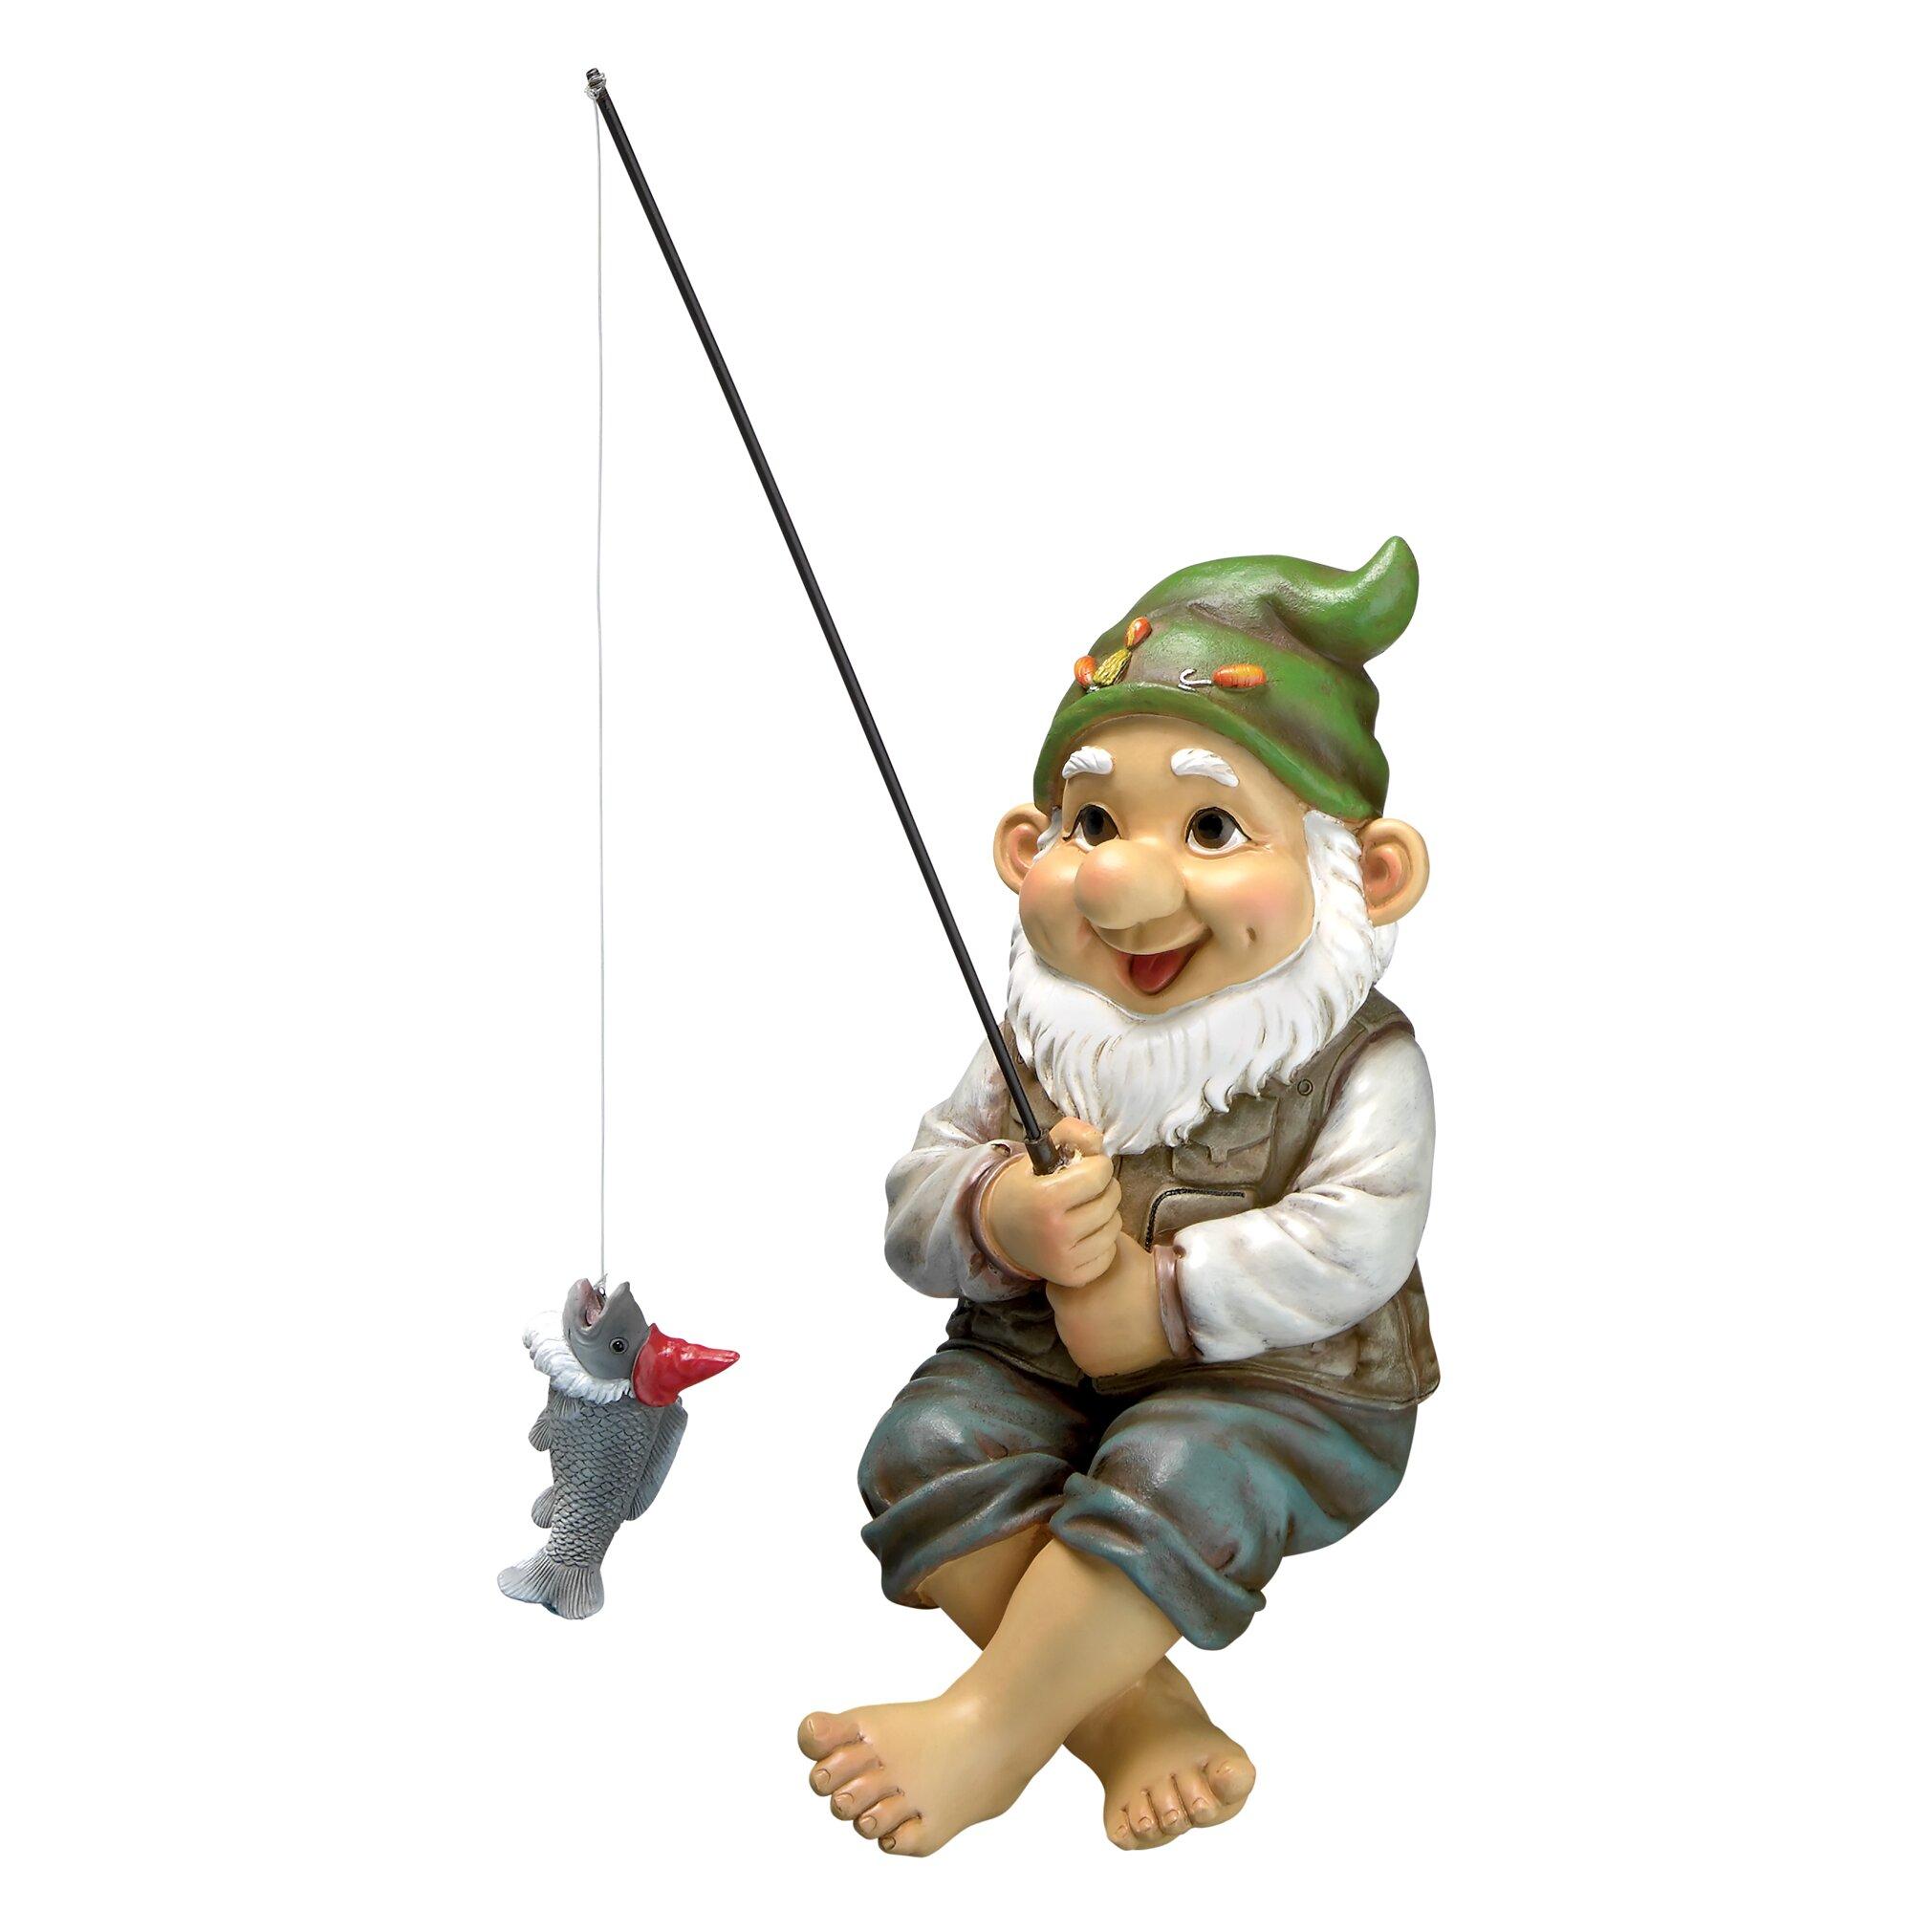 Garden Gnomes On Sale: Design Toscano Ziggy The Fishing Gnome Garden Statue